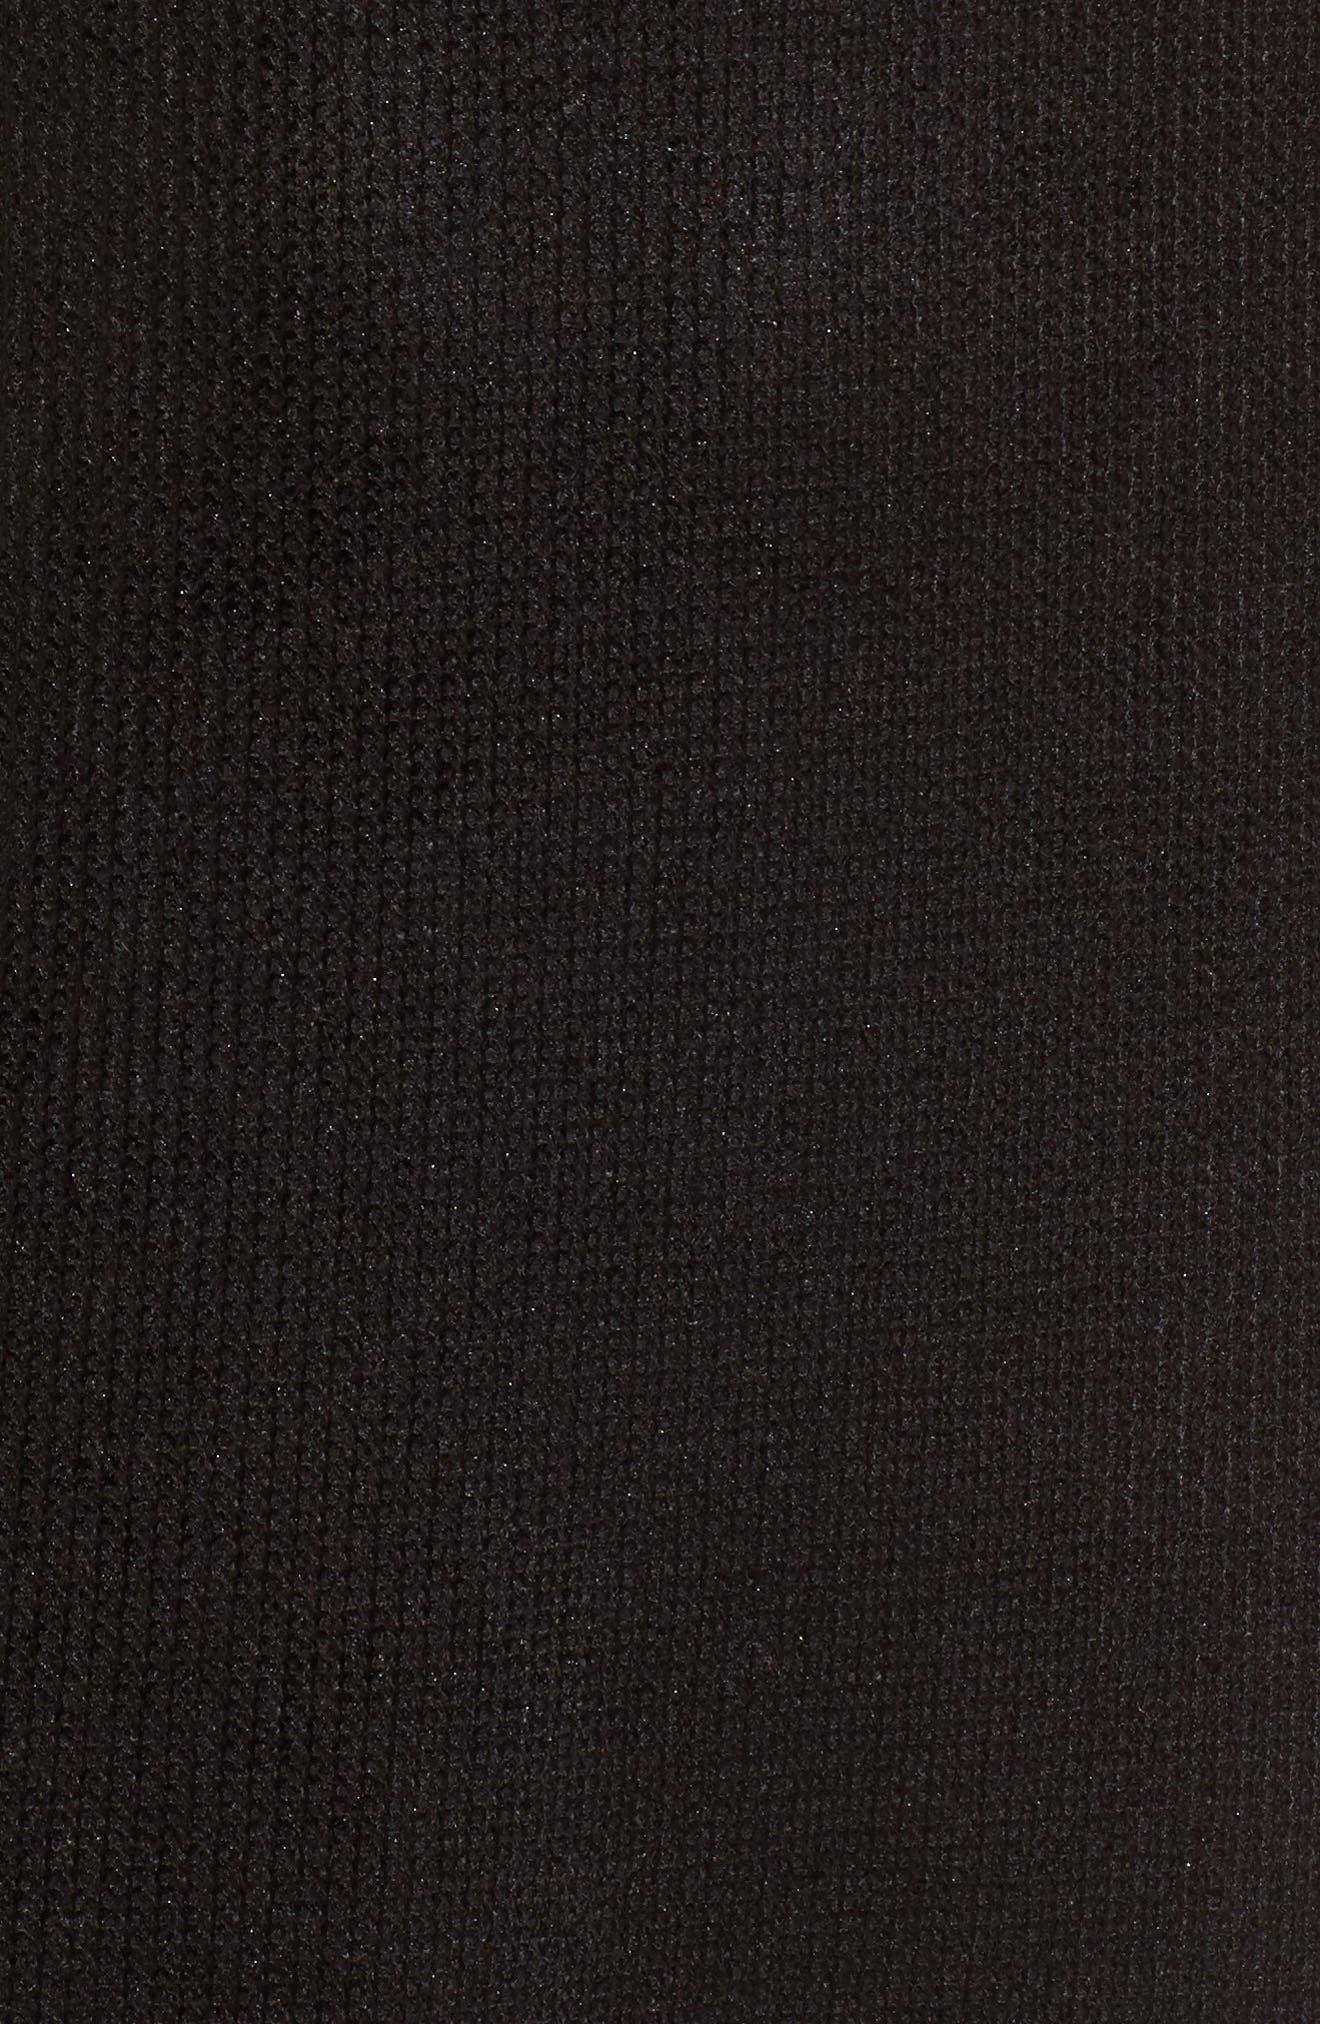 Metallic Coated Dress,                             Alternate thumbnail 5, color,                             Black